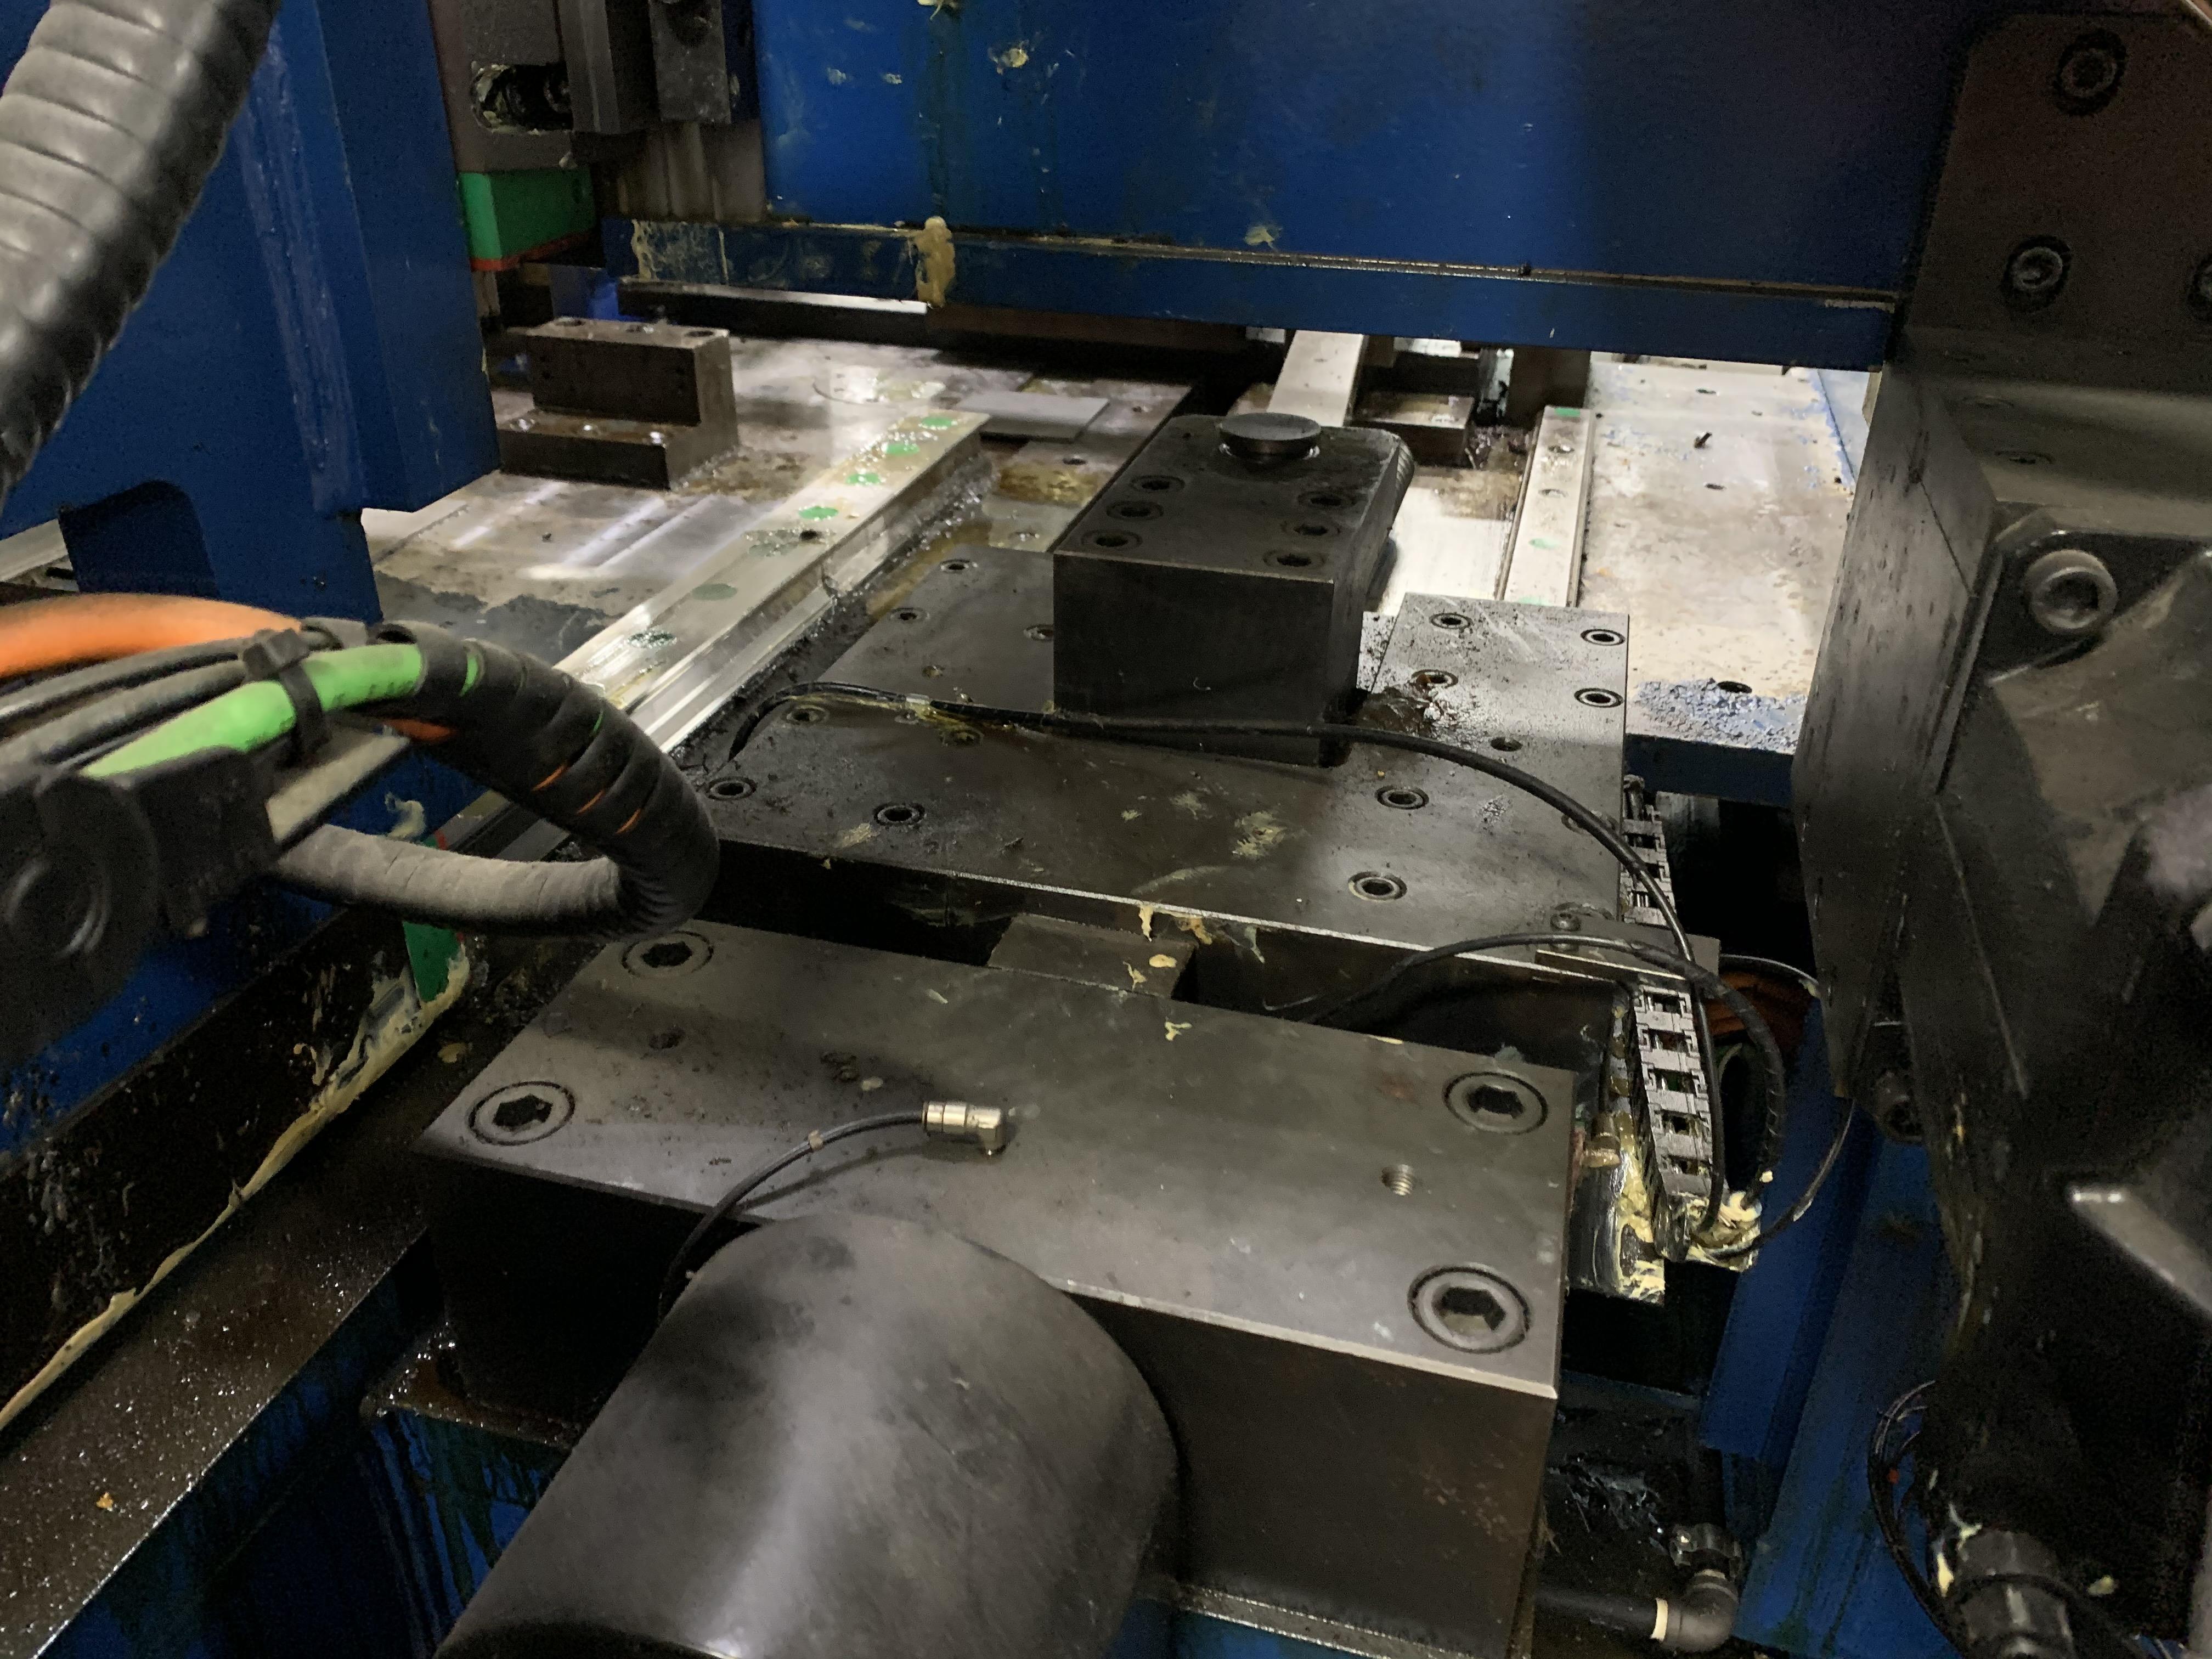 "6"" UNISON MODEL 6"" MS RH ELECTRIC CNC MULTI-STACK TUBE BENDER; S/N 2715, JOB NO. ME 4-410,(NEW 2014) - Image 26 of 72"